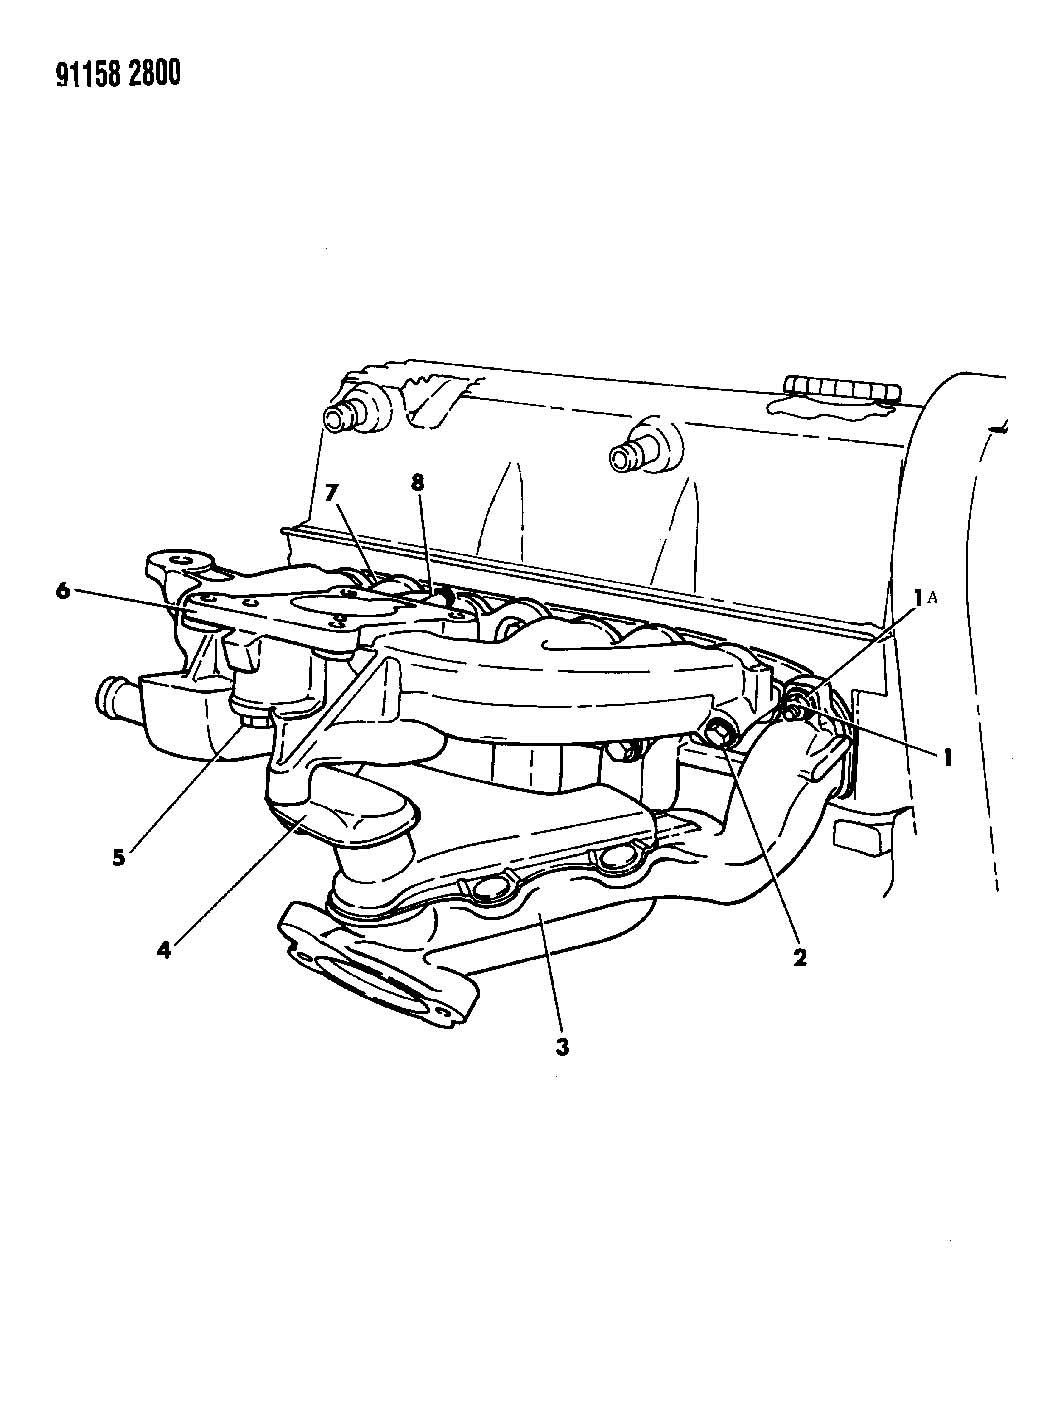 1991 dodge shadow manifolds  intake  u0026 exhaust 2 5 l engine